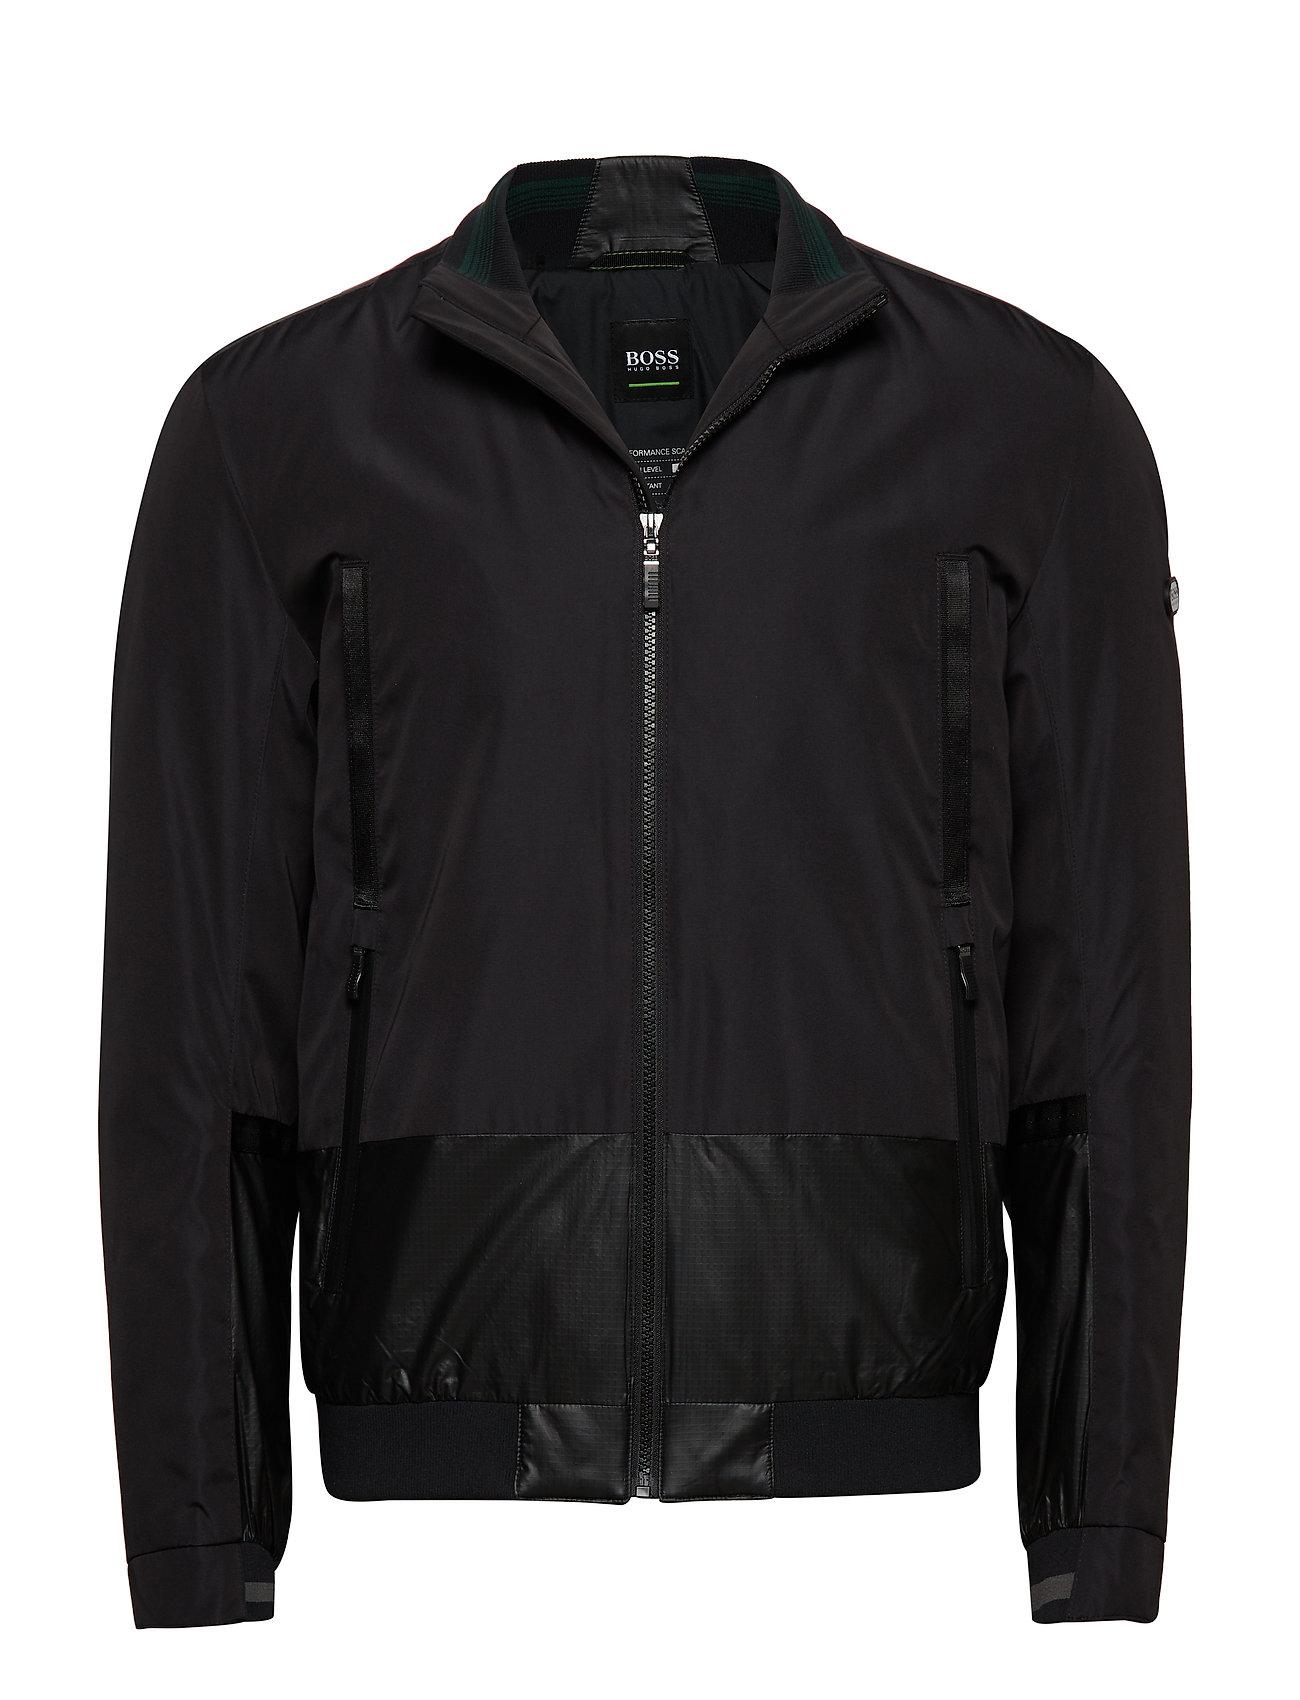 HUGO BOSS Jonn Outerwear Sport Jackets Schwarz BOSS ATHLEISURE WEAR